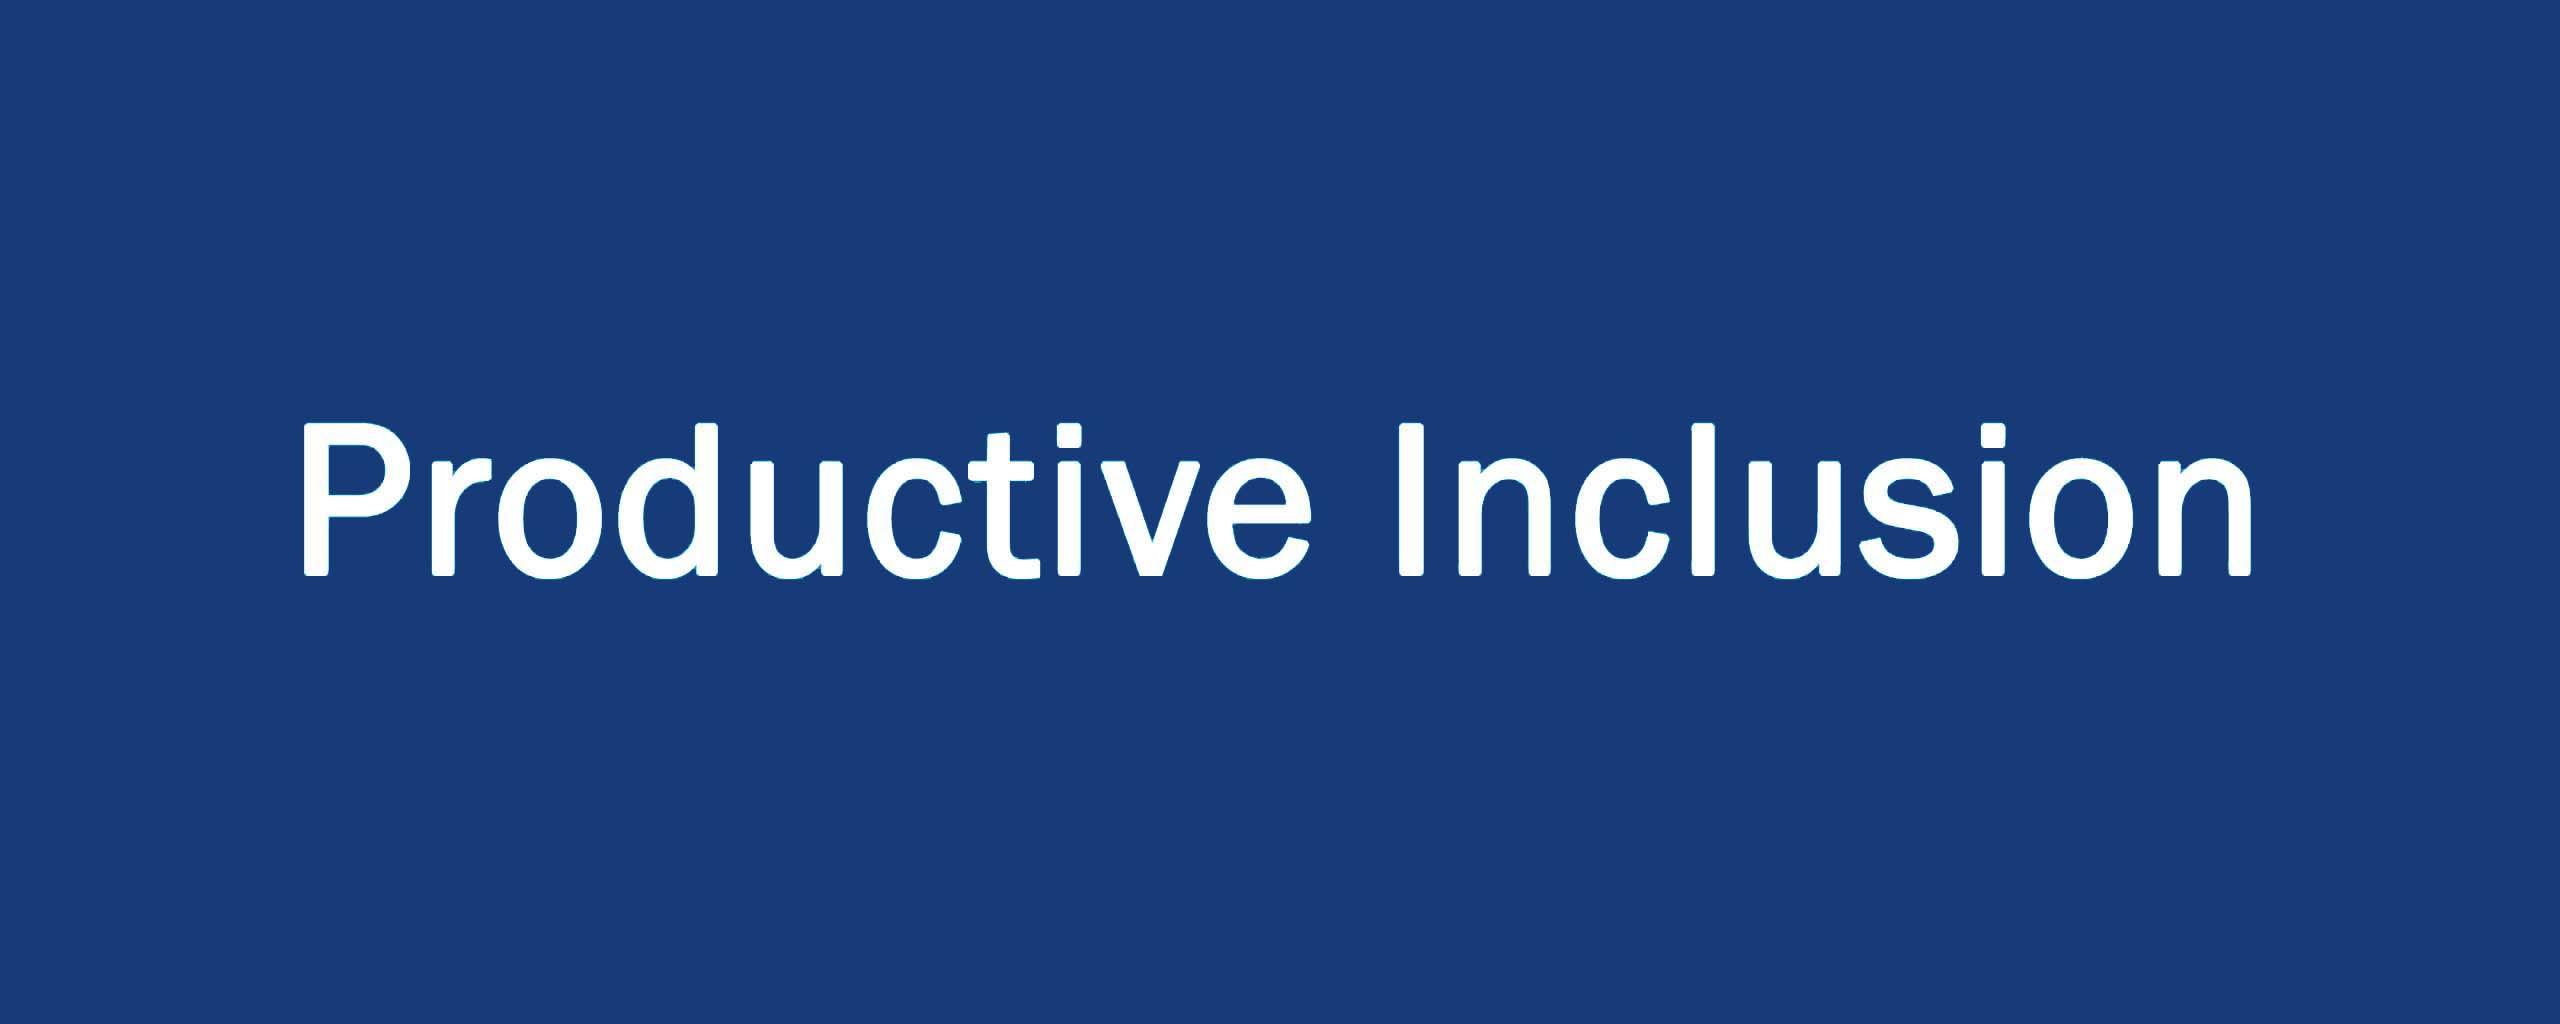 Productive Inclusion